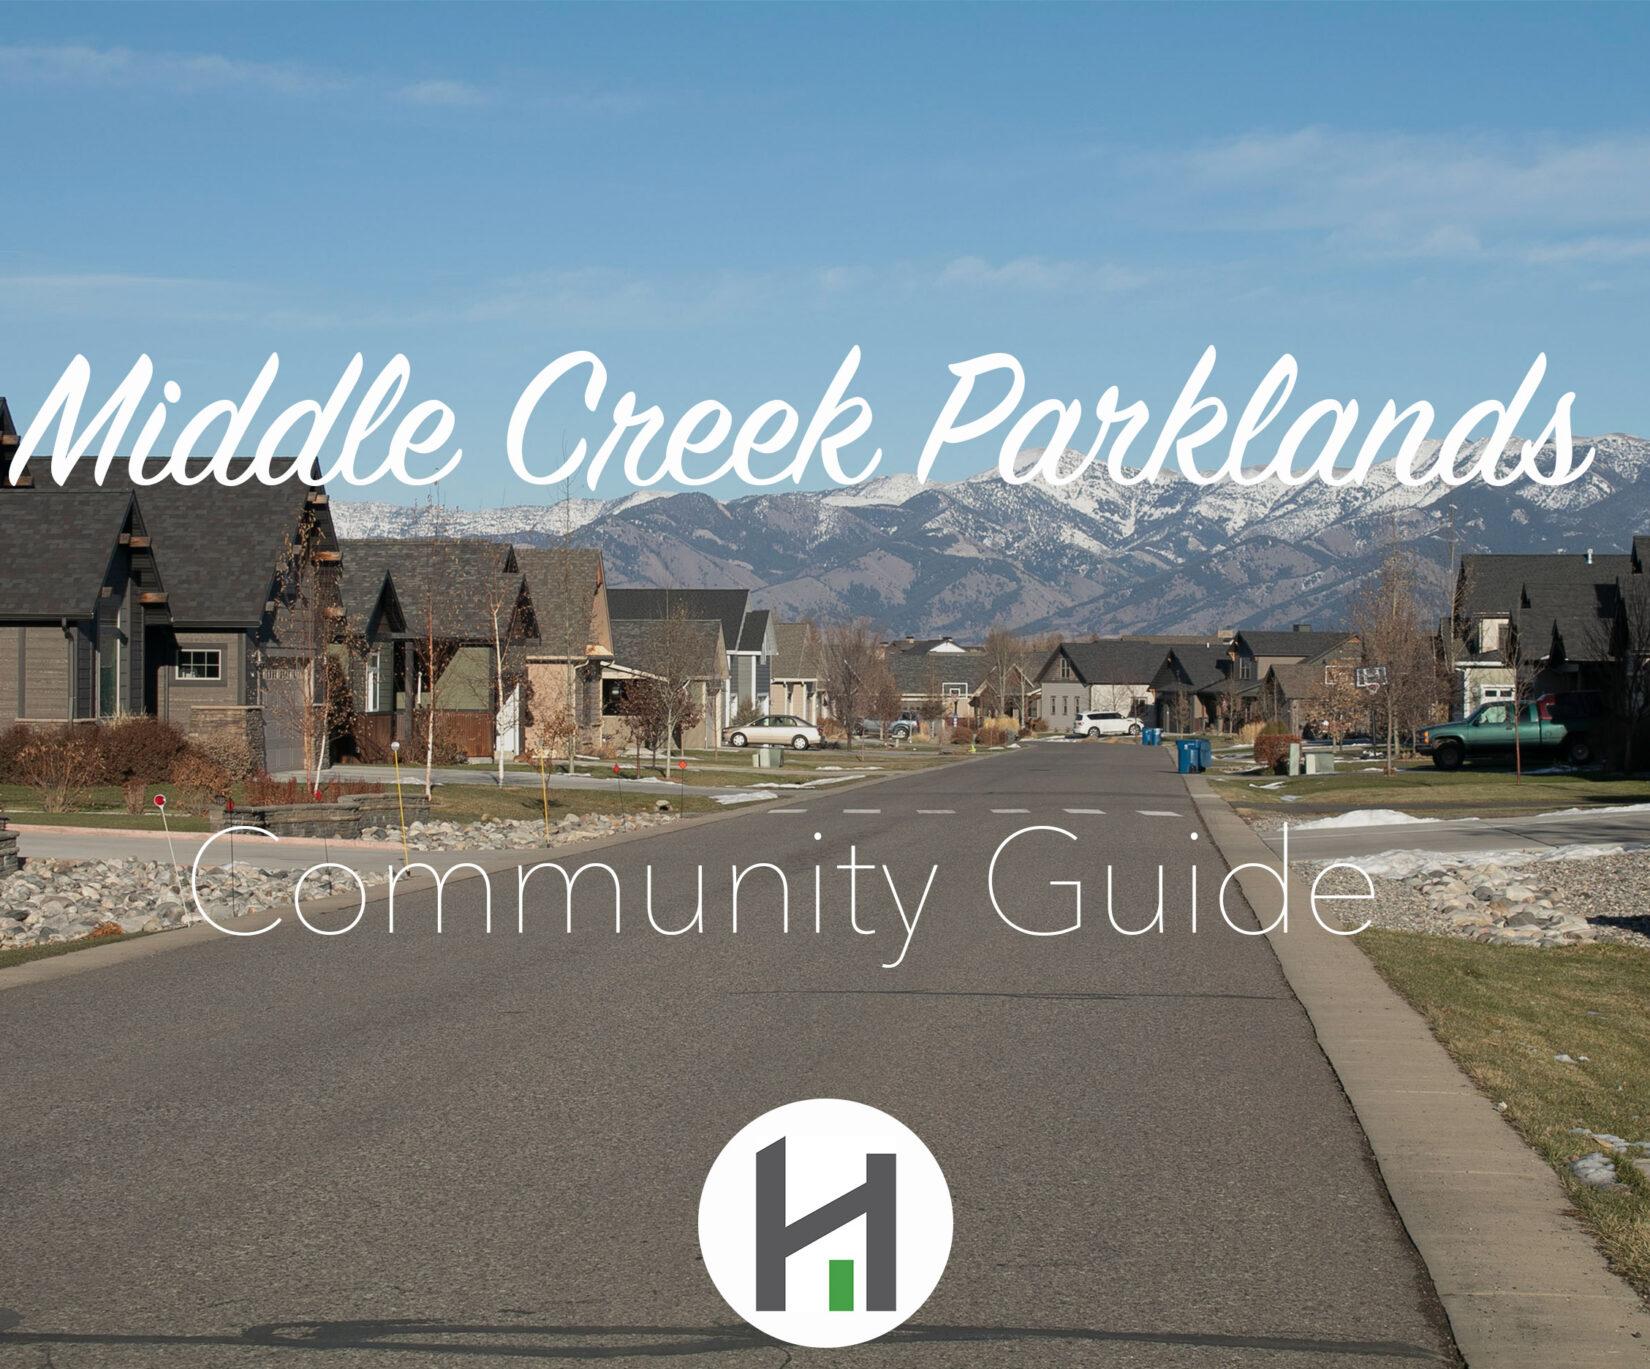 Find Middle Creek Parklands Real Estate and Homes for Sale in Bozeman MT